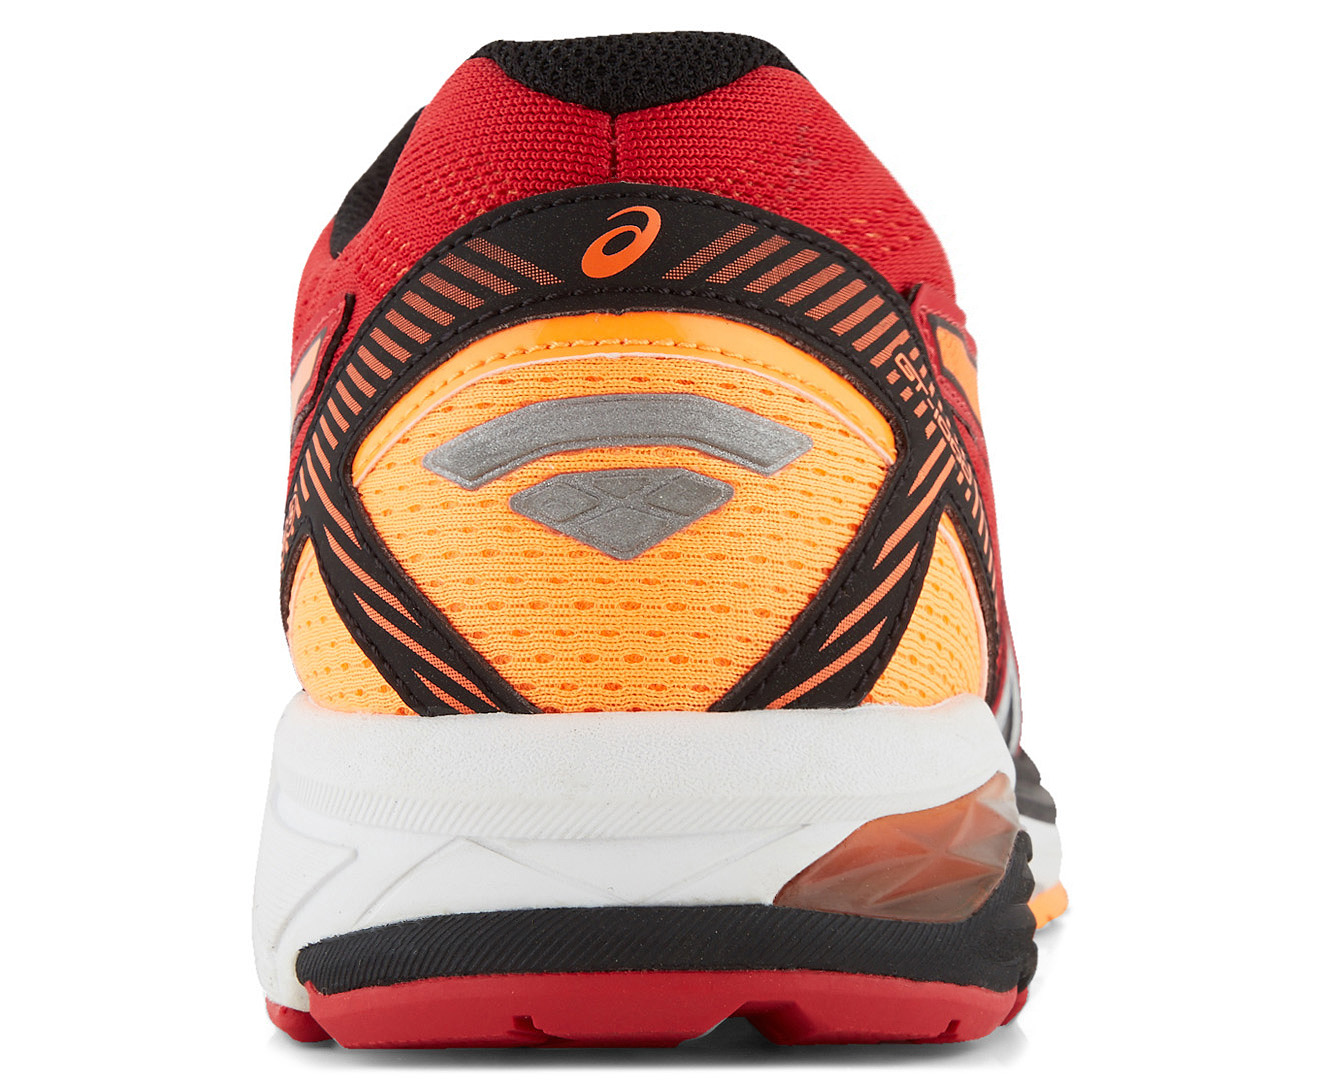 56f2692dac8f ASICS Men s GT-1000 5 Running Shoe - True Red Silver Hot Orange ...